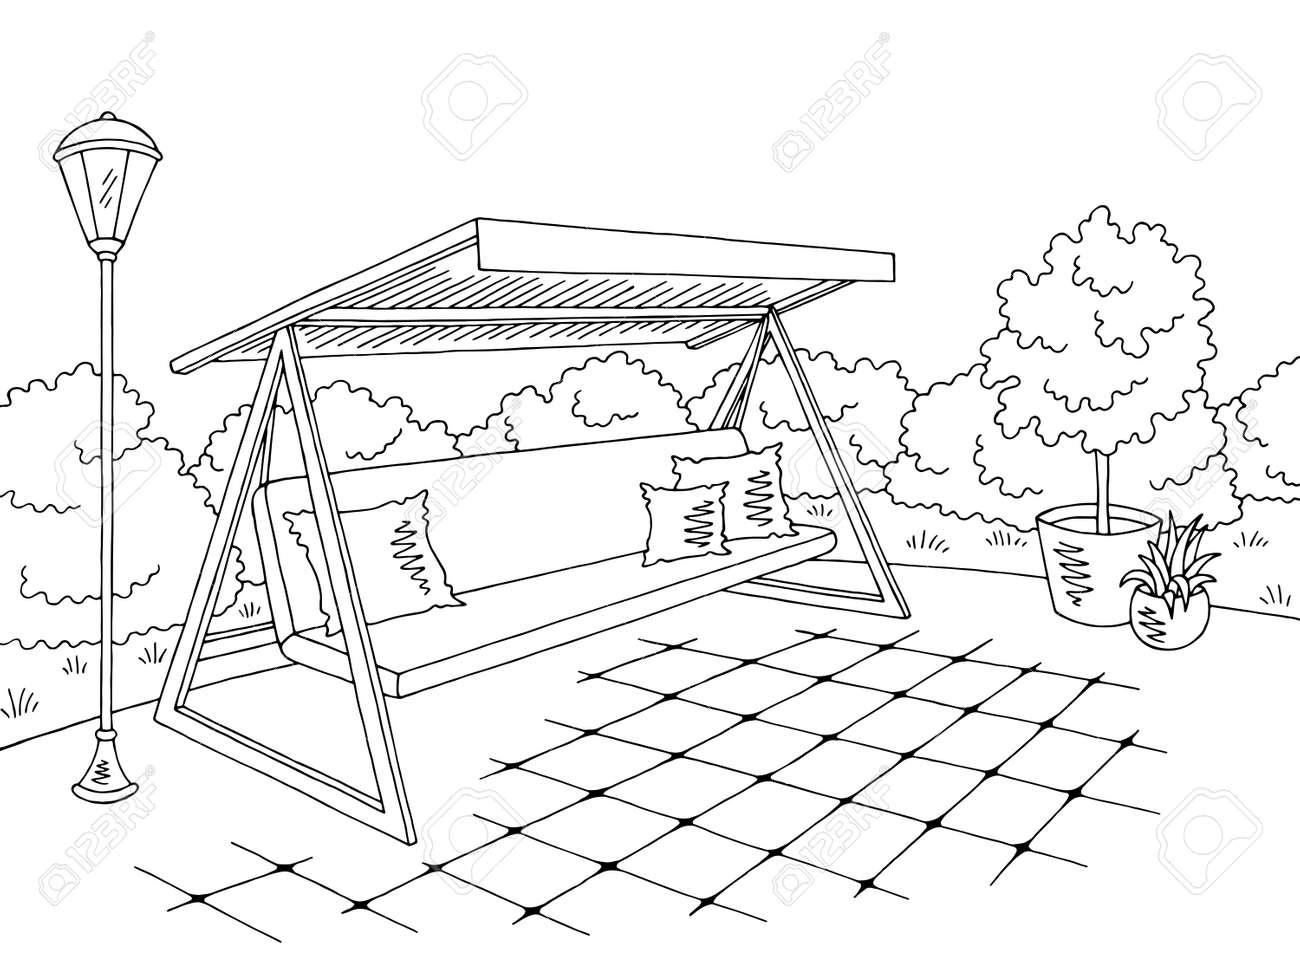 Garden Swing Sketch Design Royalty Free Cliparts Vectors And